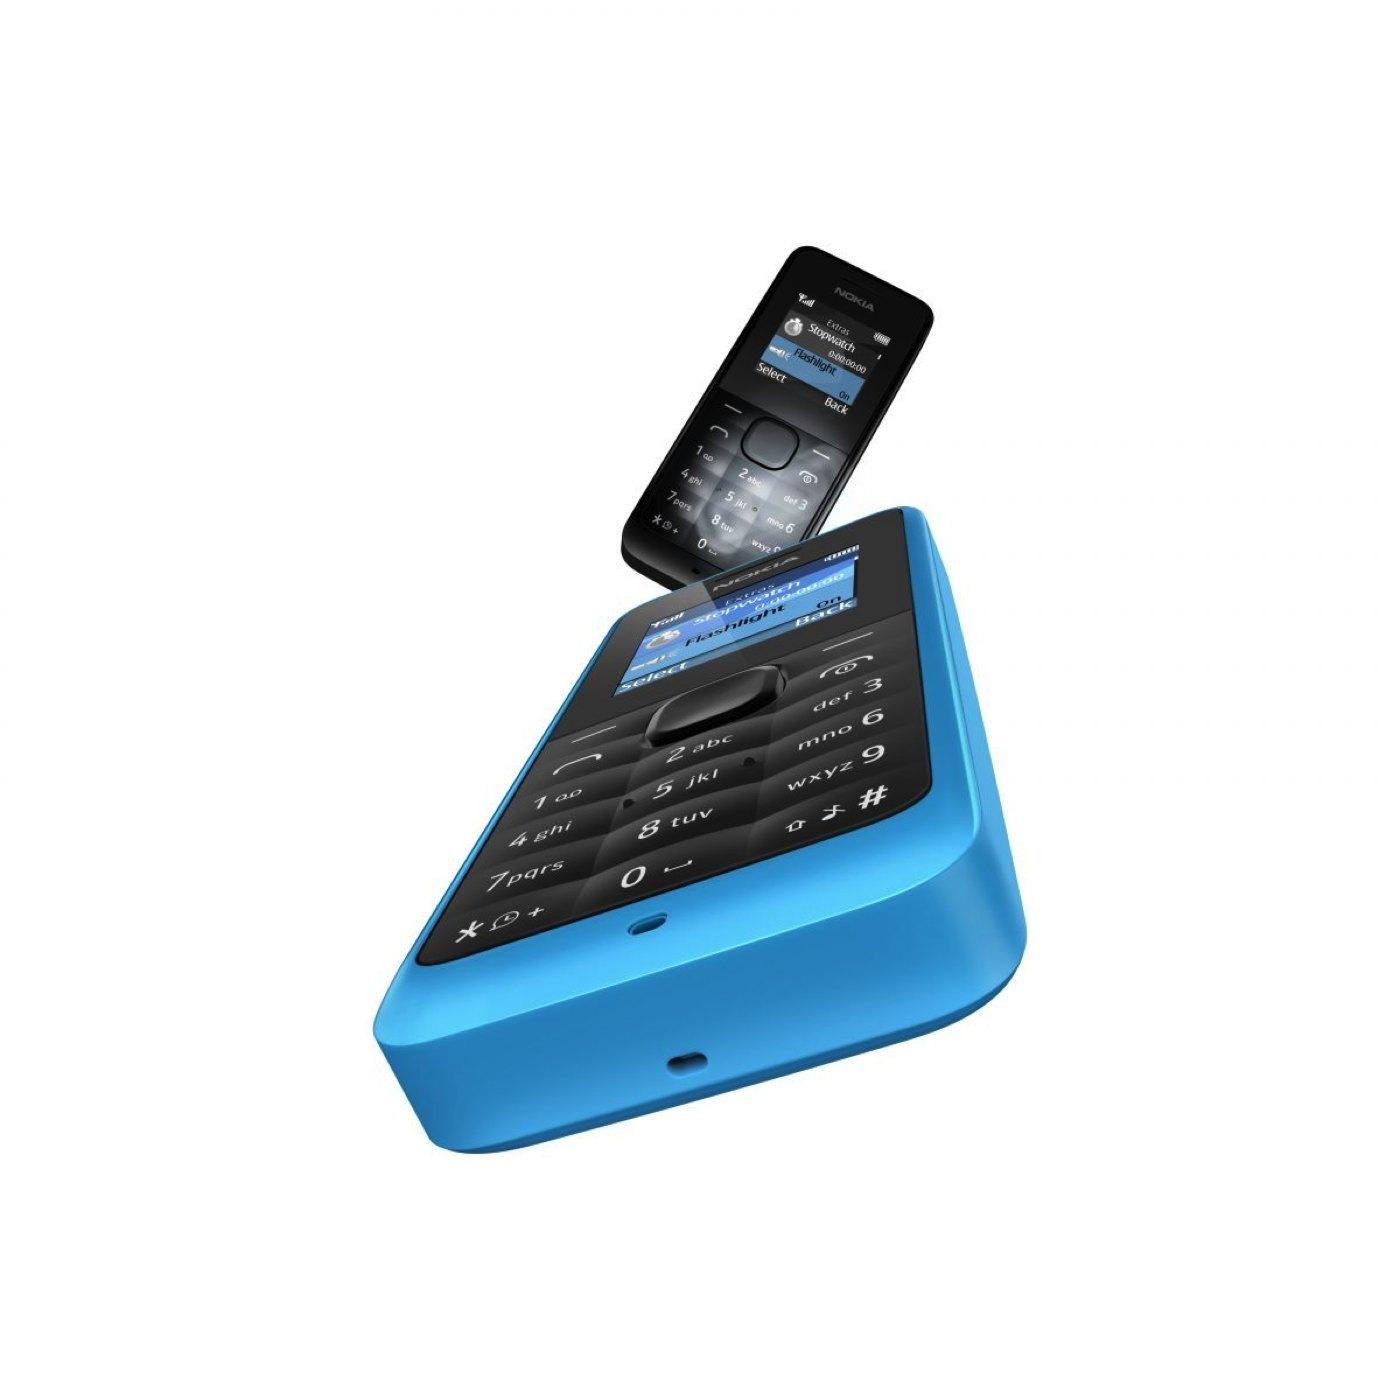 Foto de Nokia 105 (4/5)